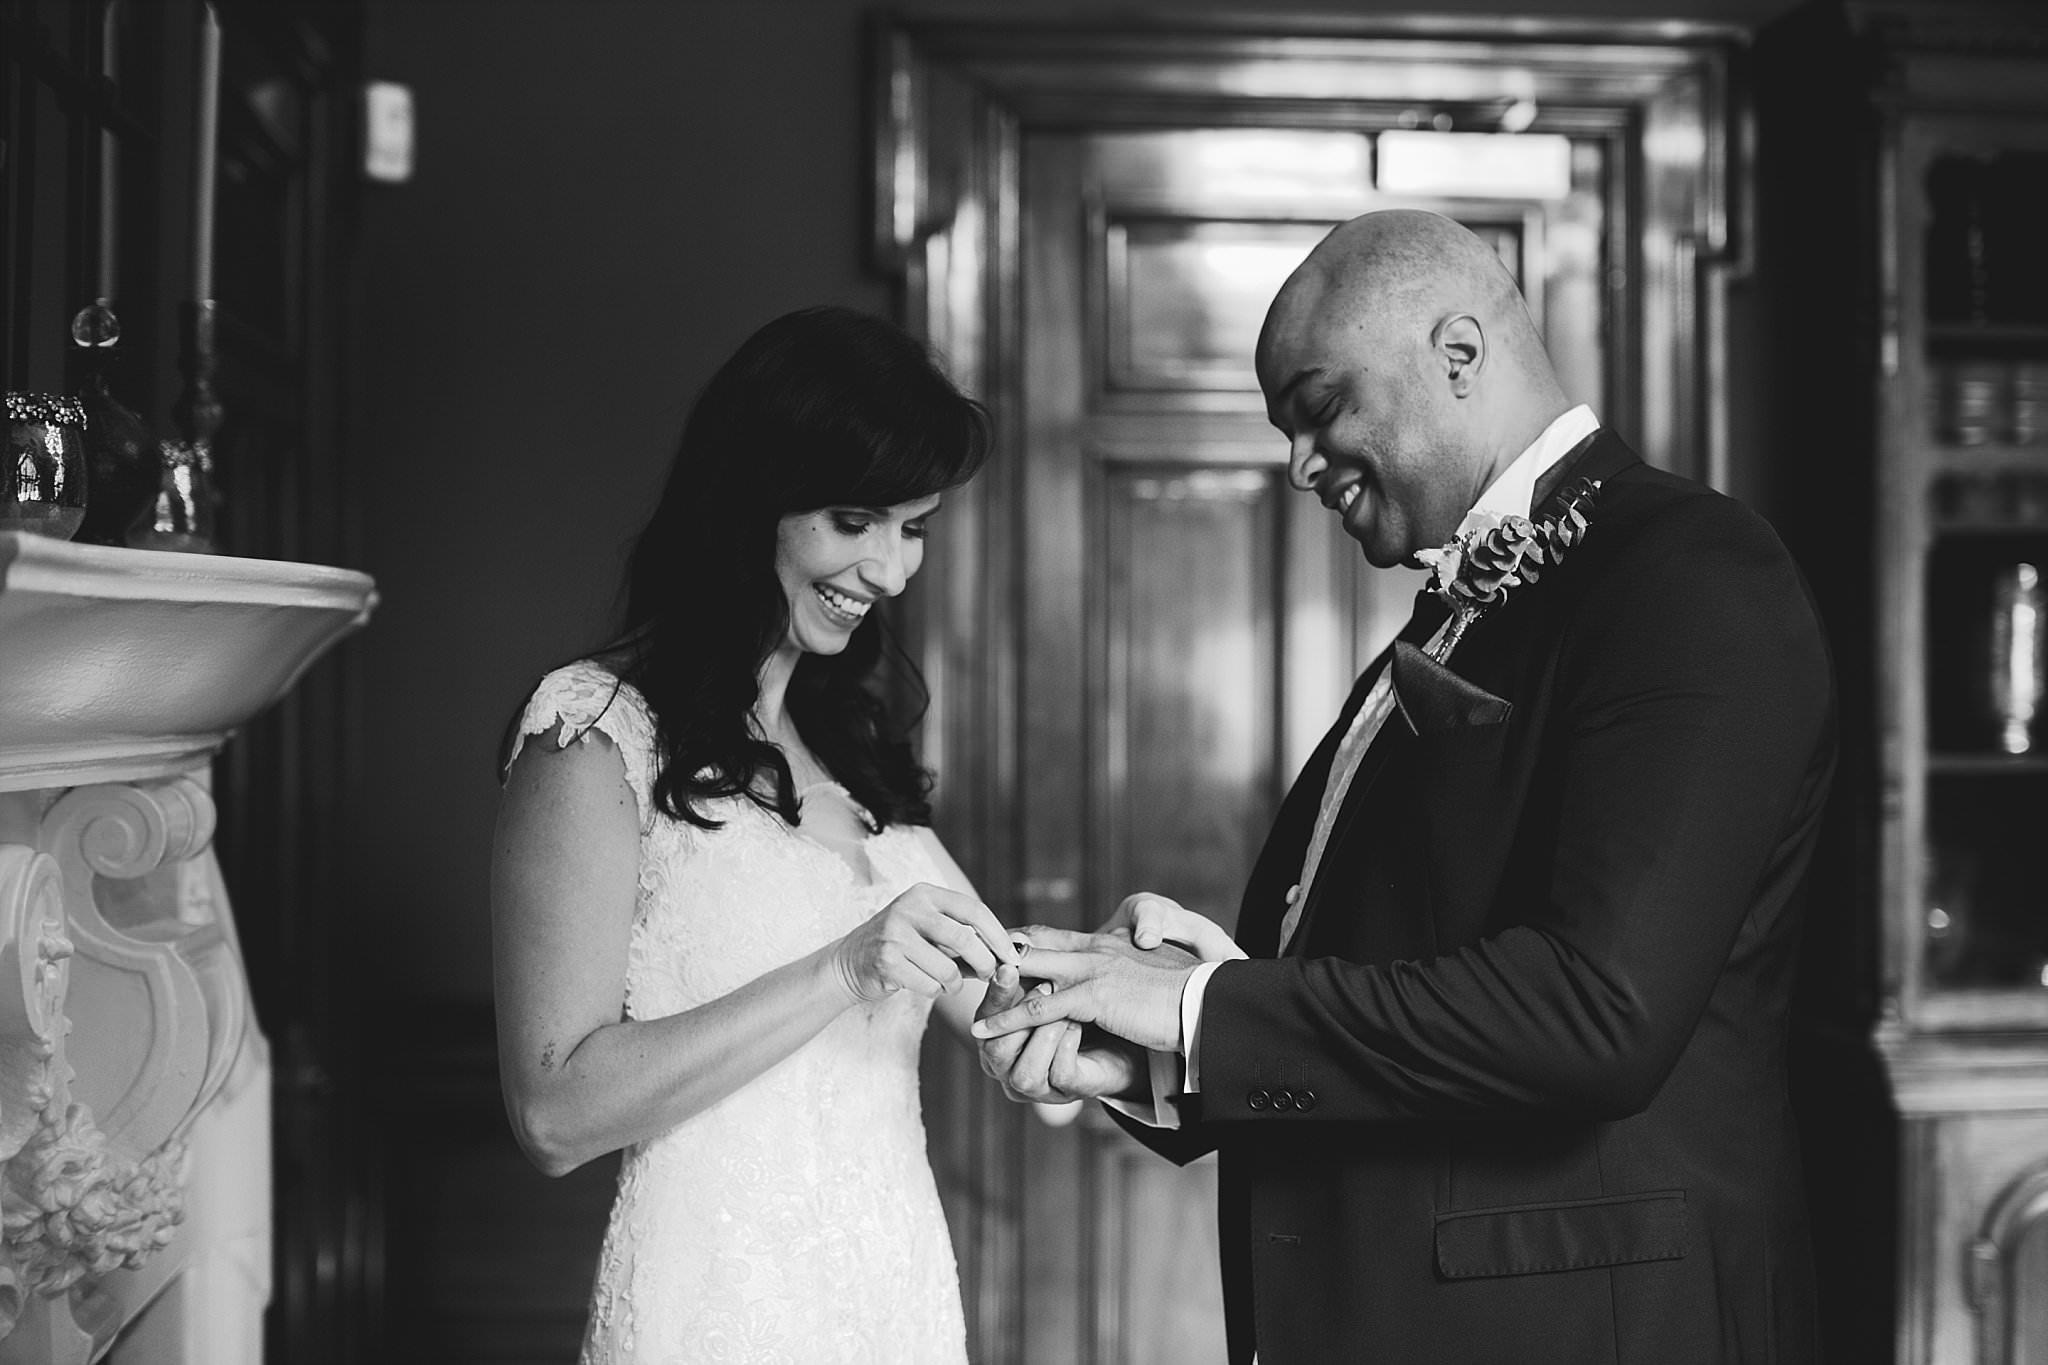 The Gibsons,canadian wedding in scotland,city wedding Glasgow,elopement scotland,fine art wedding photographer scotland,glasgow wedding photographer,natural wedding photographers,romantic photographers Scotland,